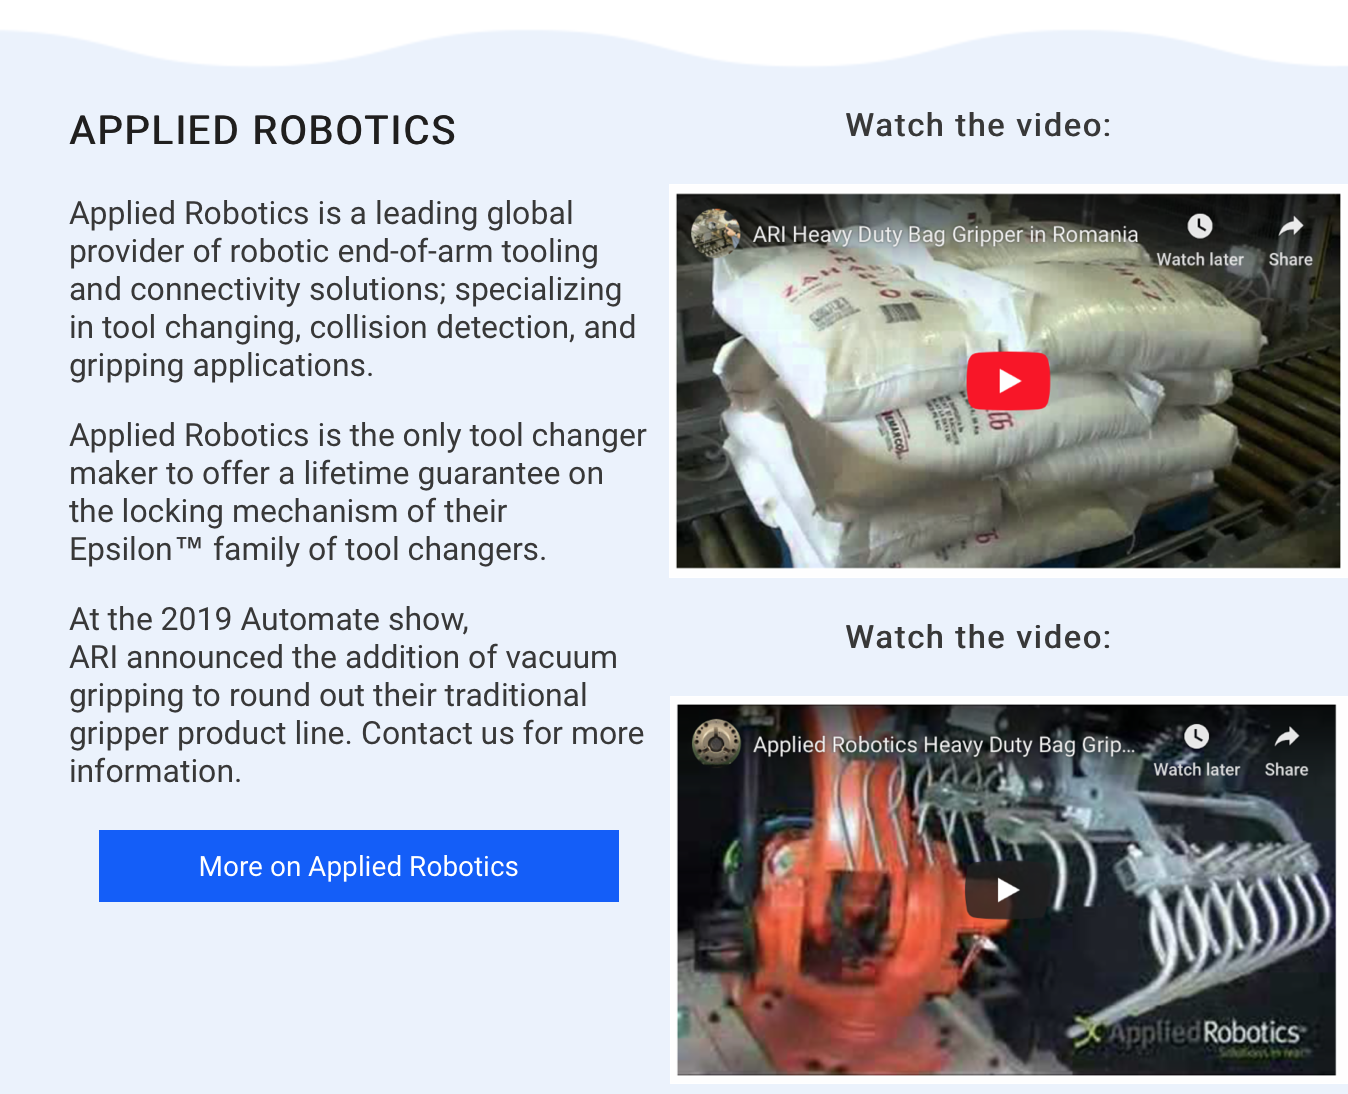 Futura and Applied Robotics